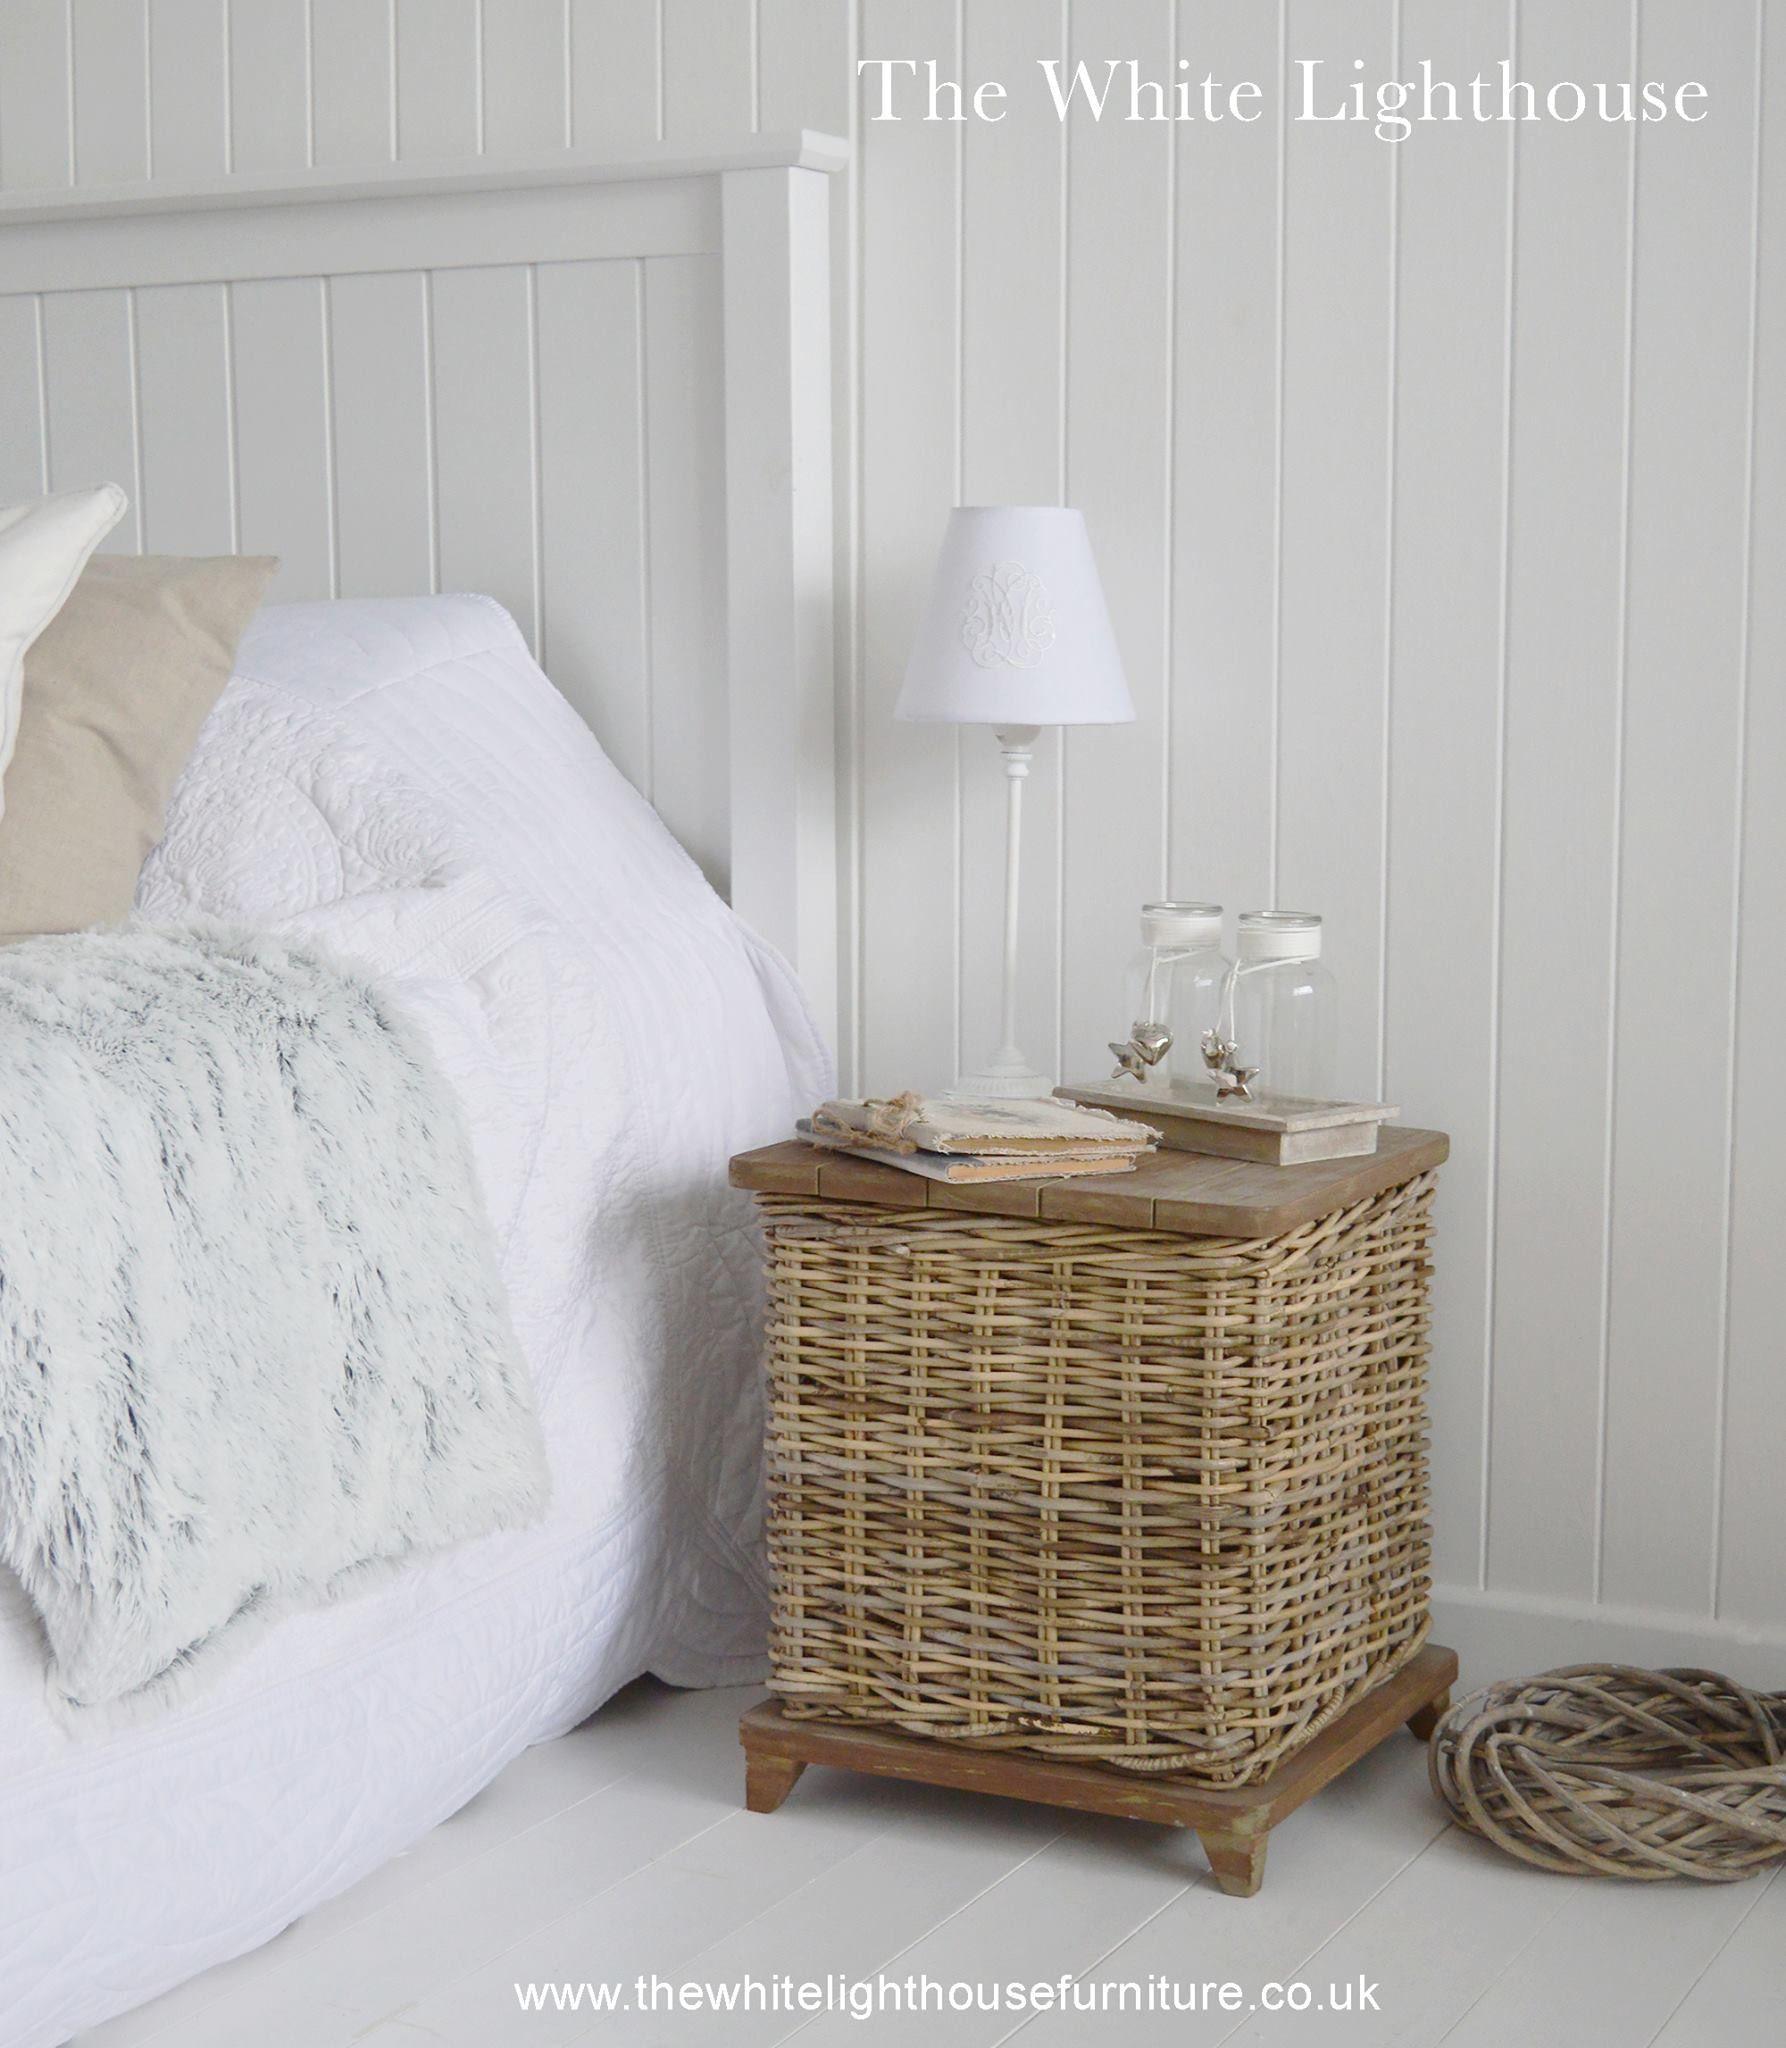 Affordable furniture and home decor. Bringing together ...